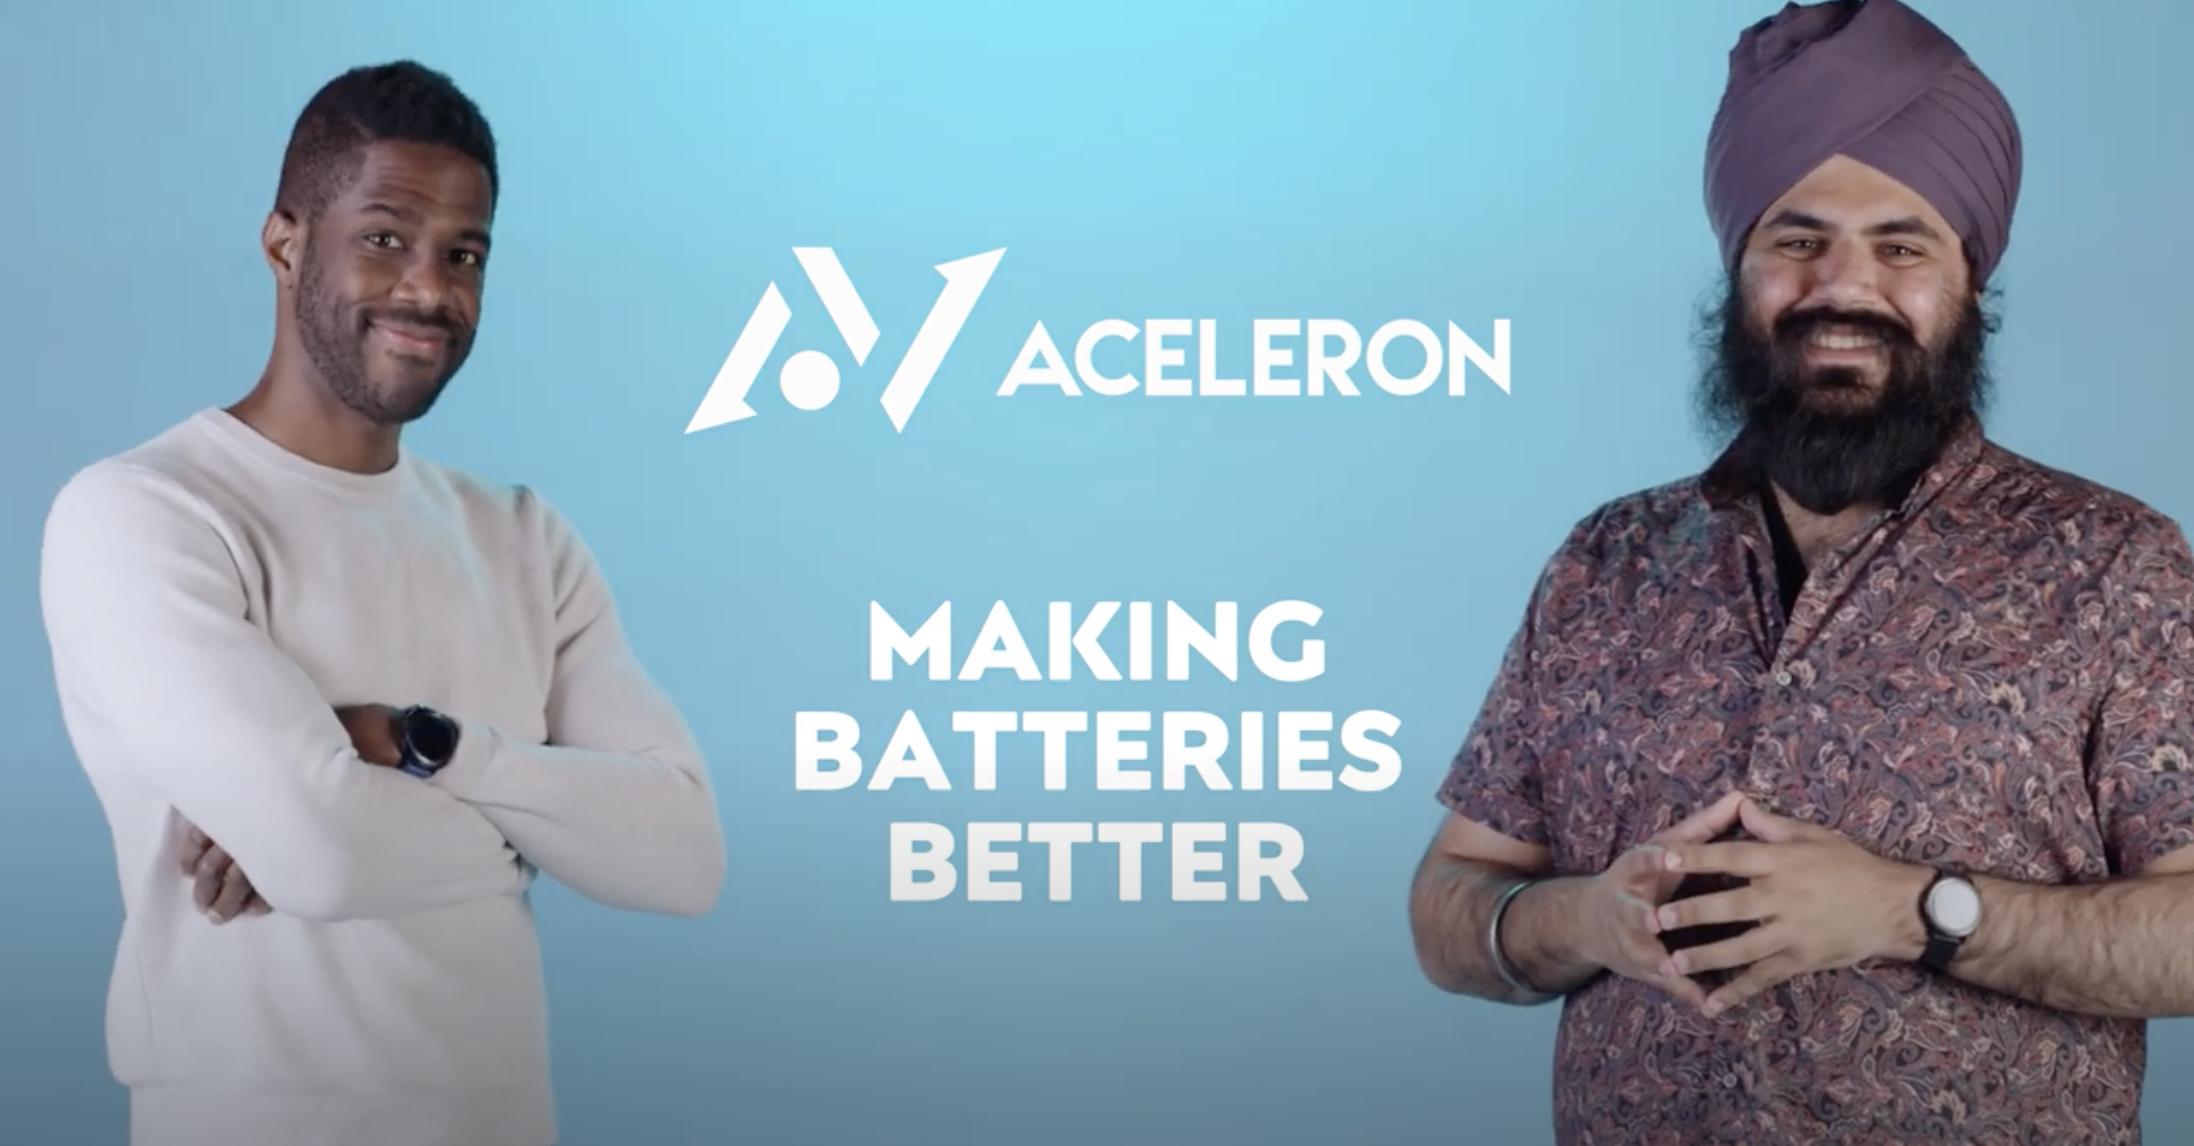 Our Story | Aceleron